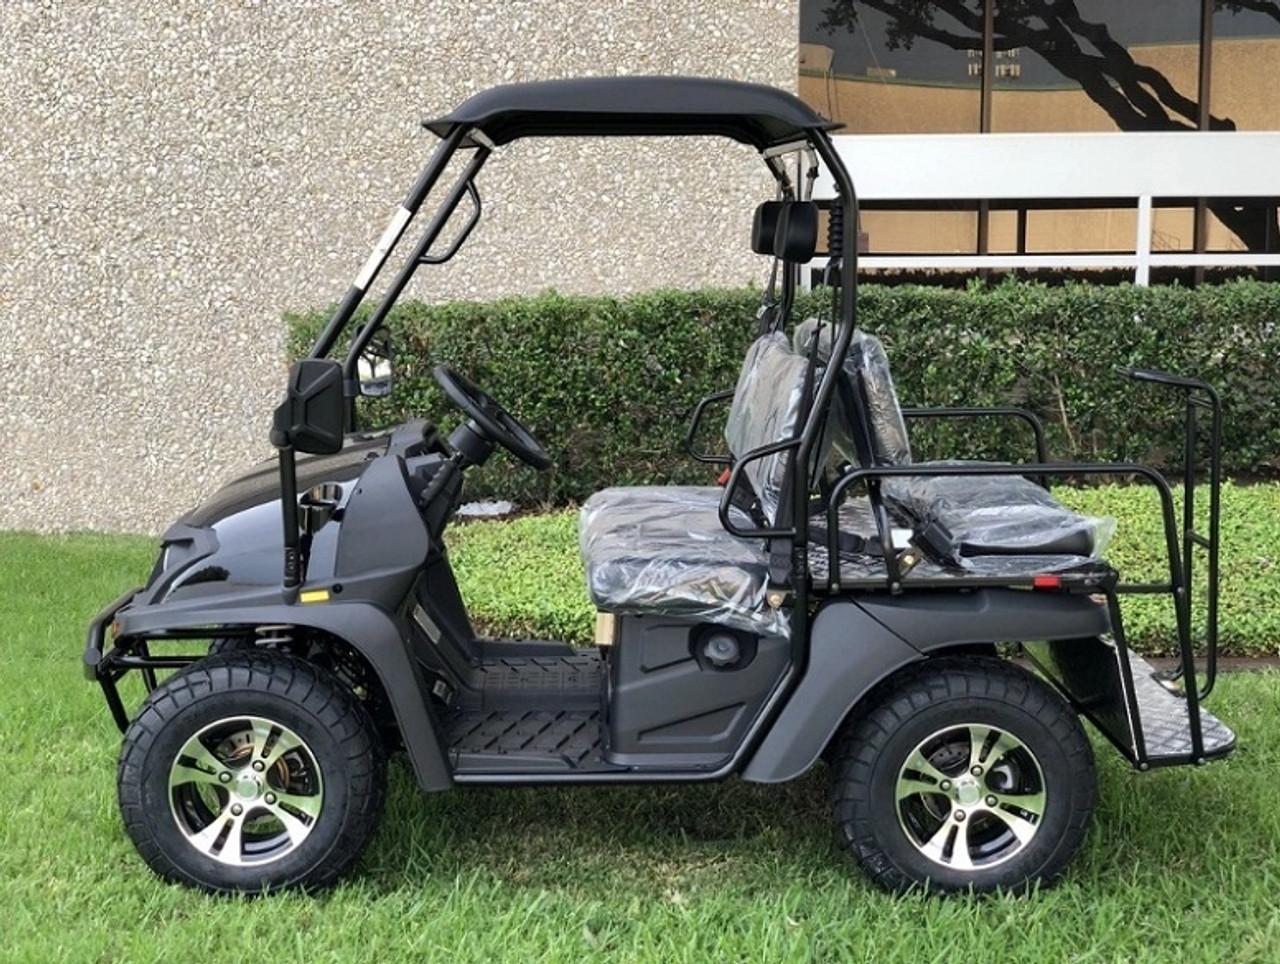 Black- Fully Loaded Cazador OUTFITTER 200 Golf Cart 4 Seater Street Legal UTV